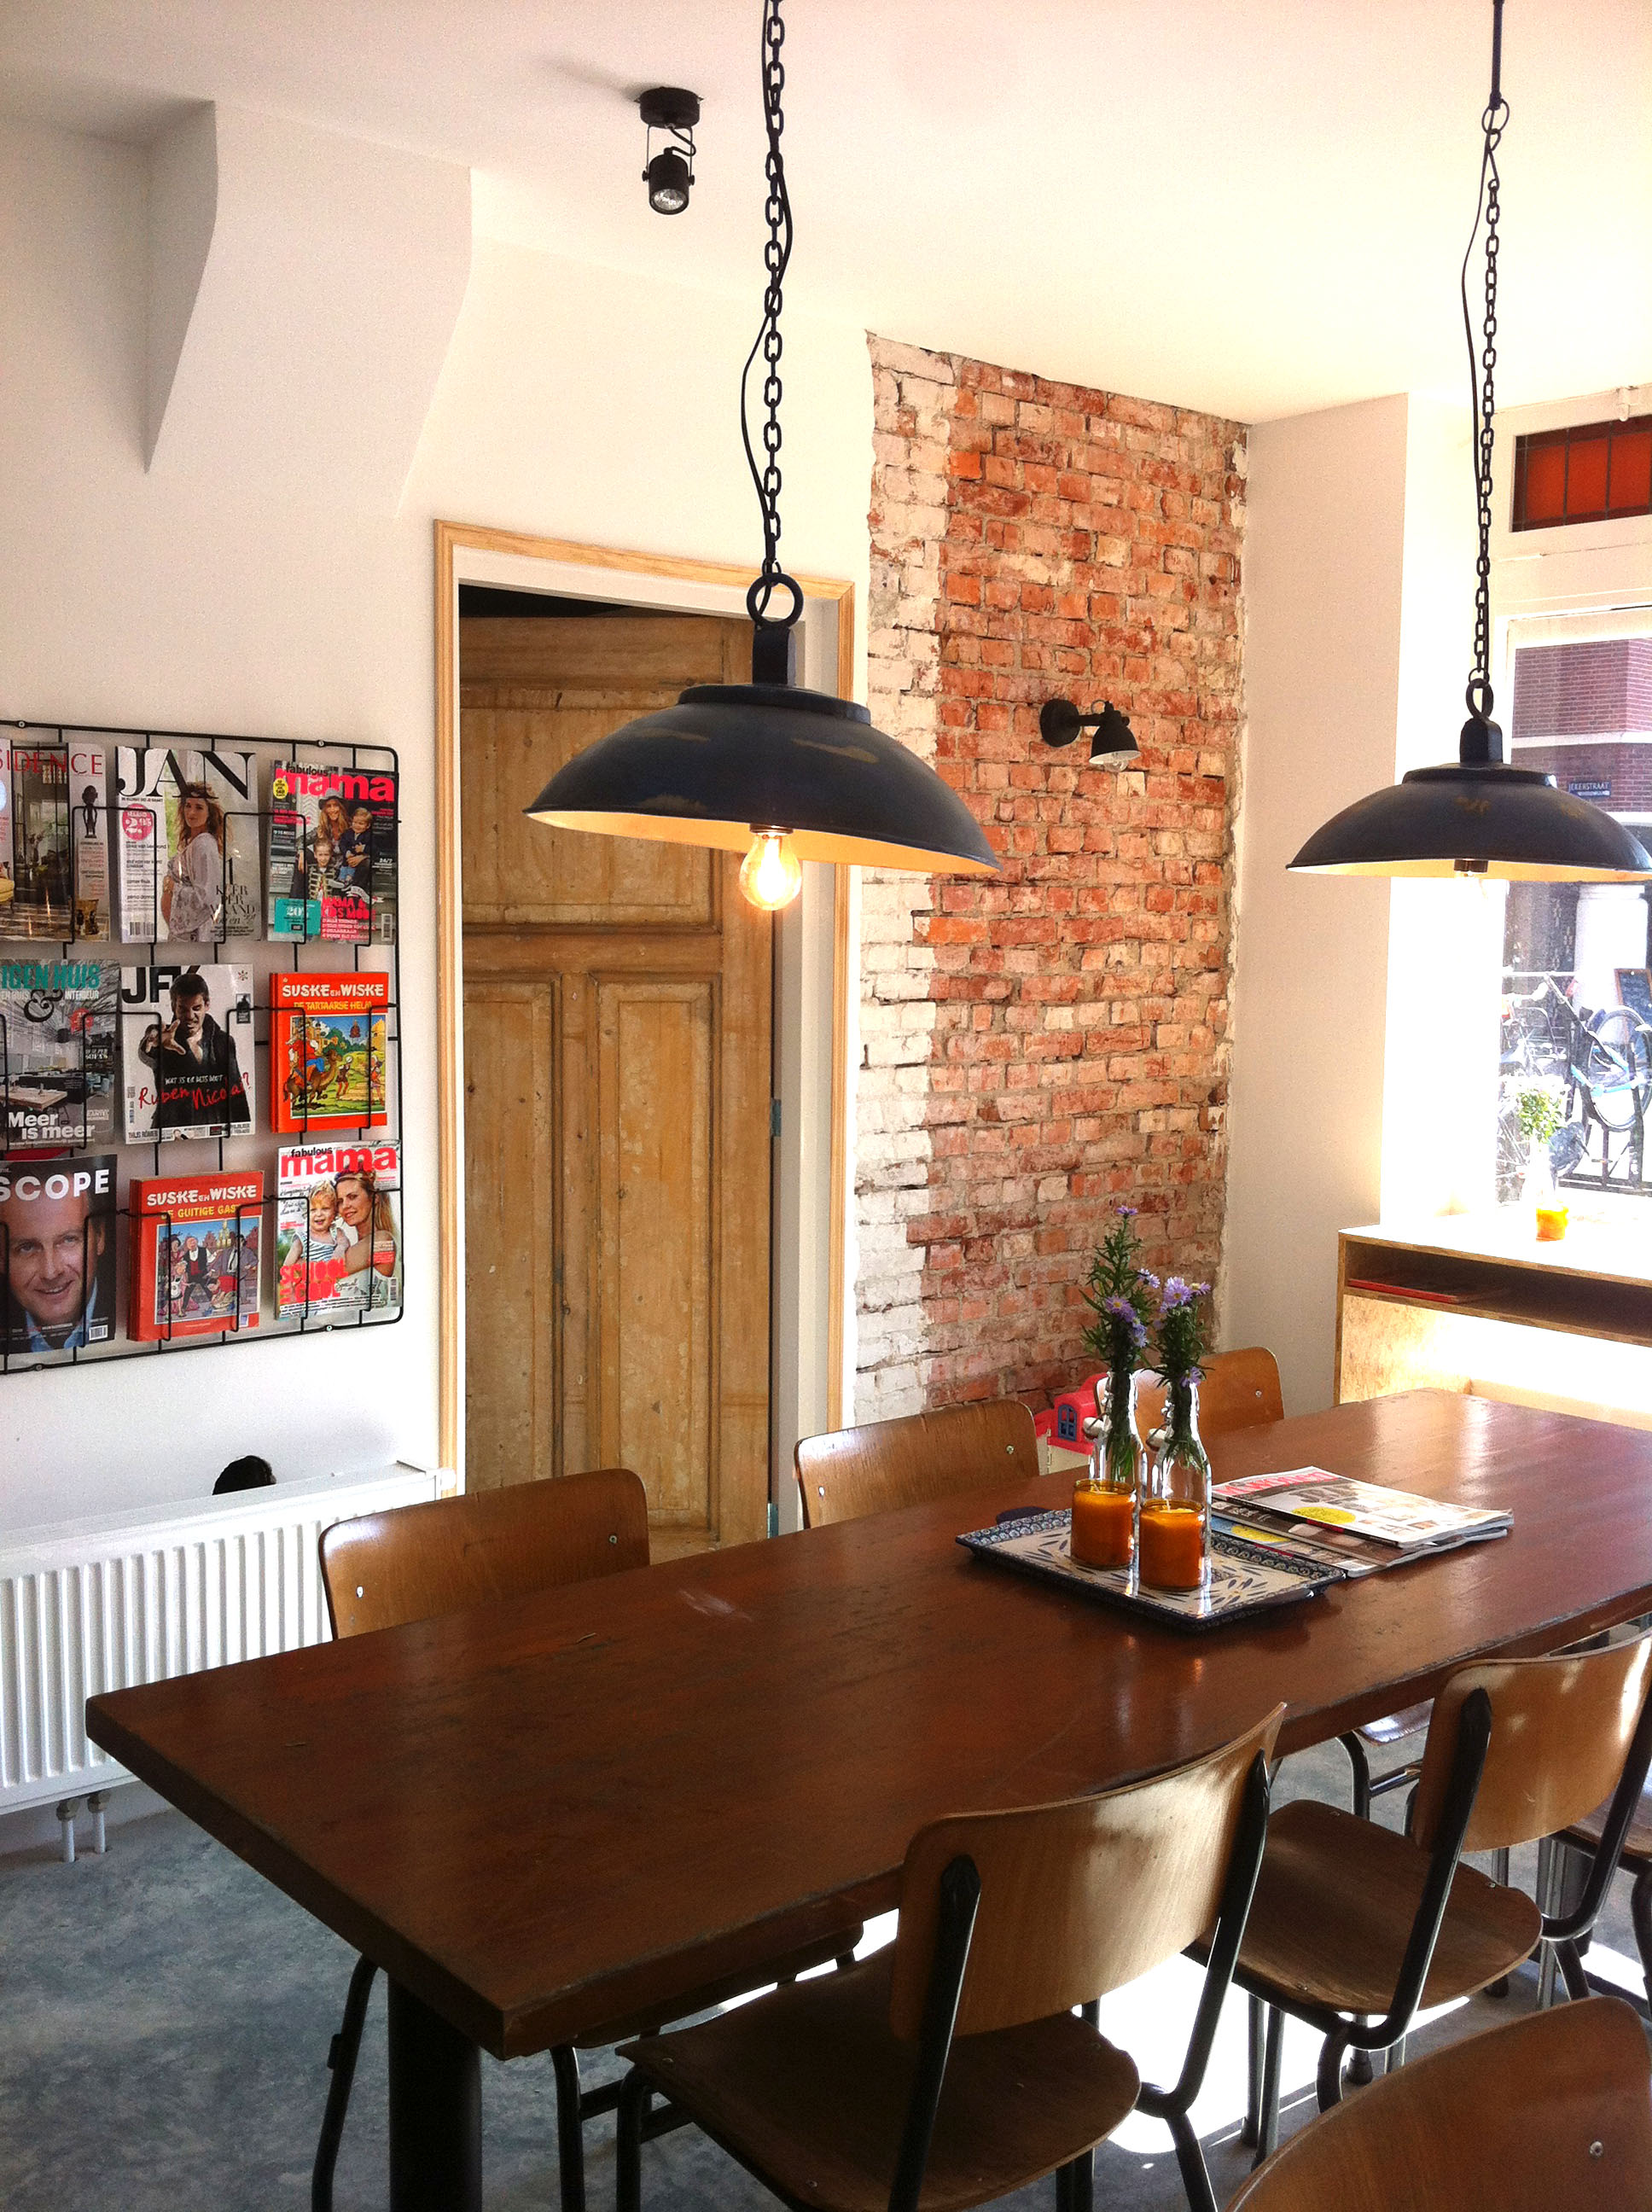 Interieurontwerp - Vintage keukenmeubilair ...